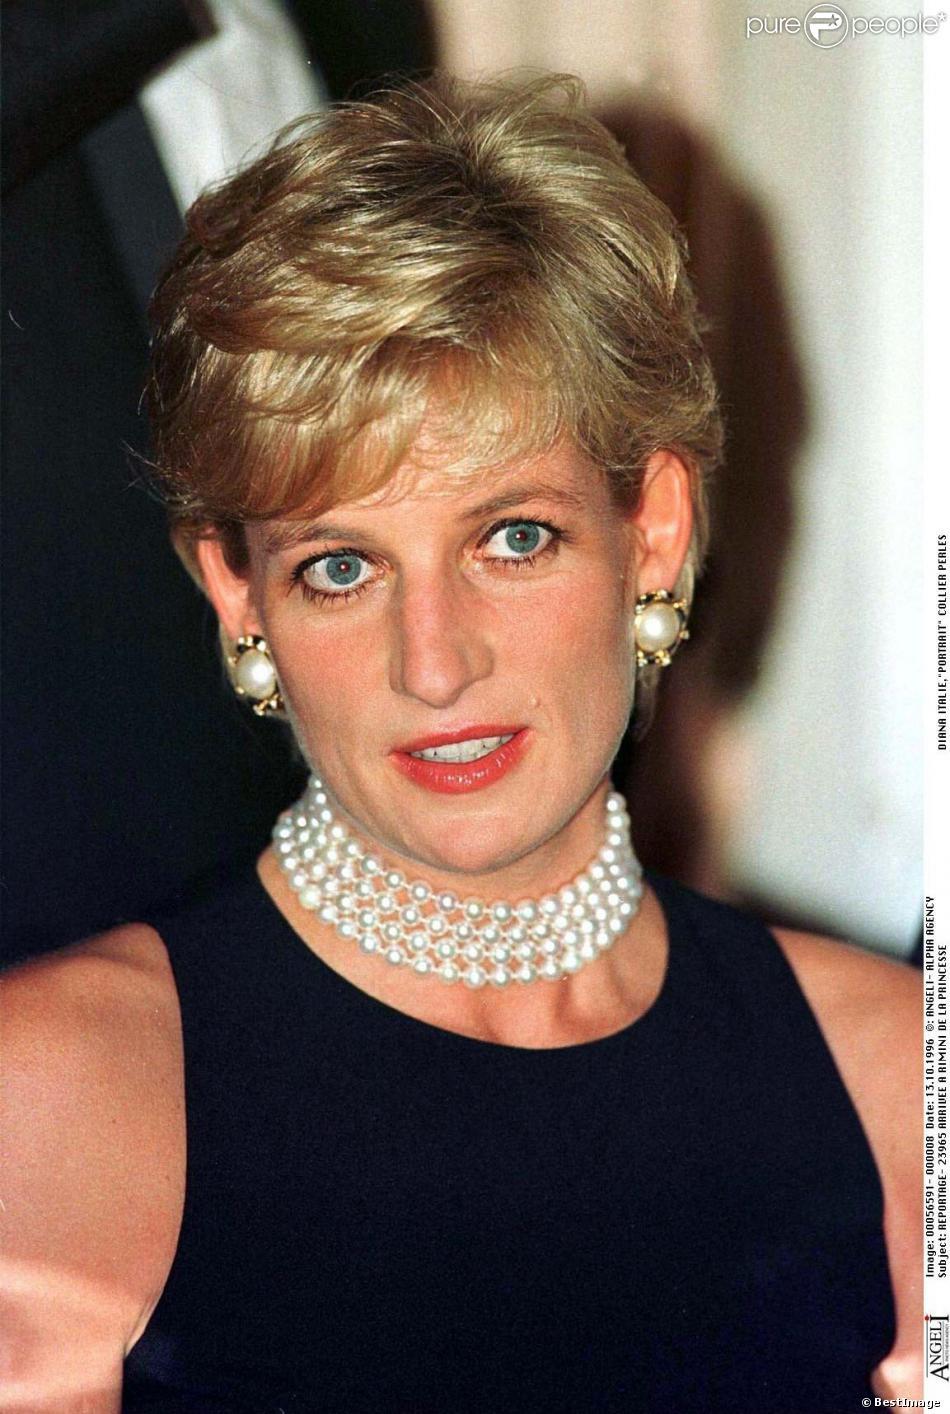 La princesse Diana à Rimini en Italie, le 13 octobre 1996.